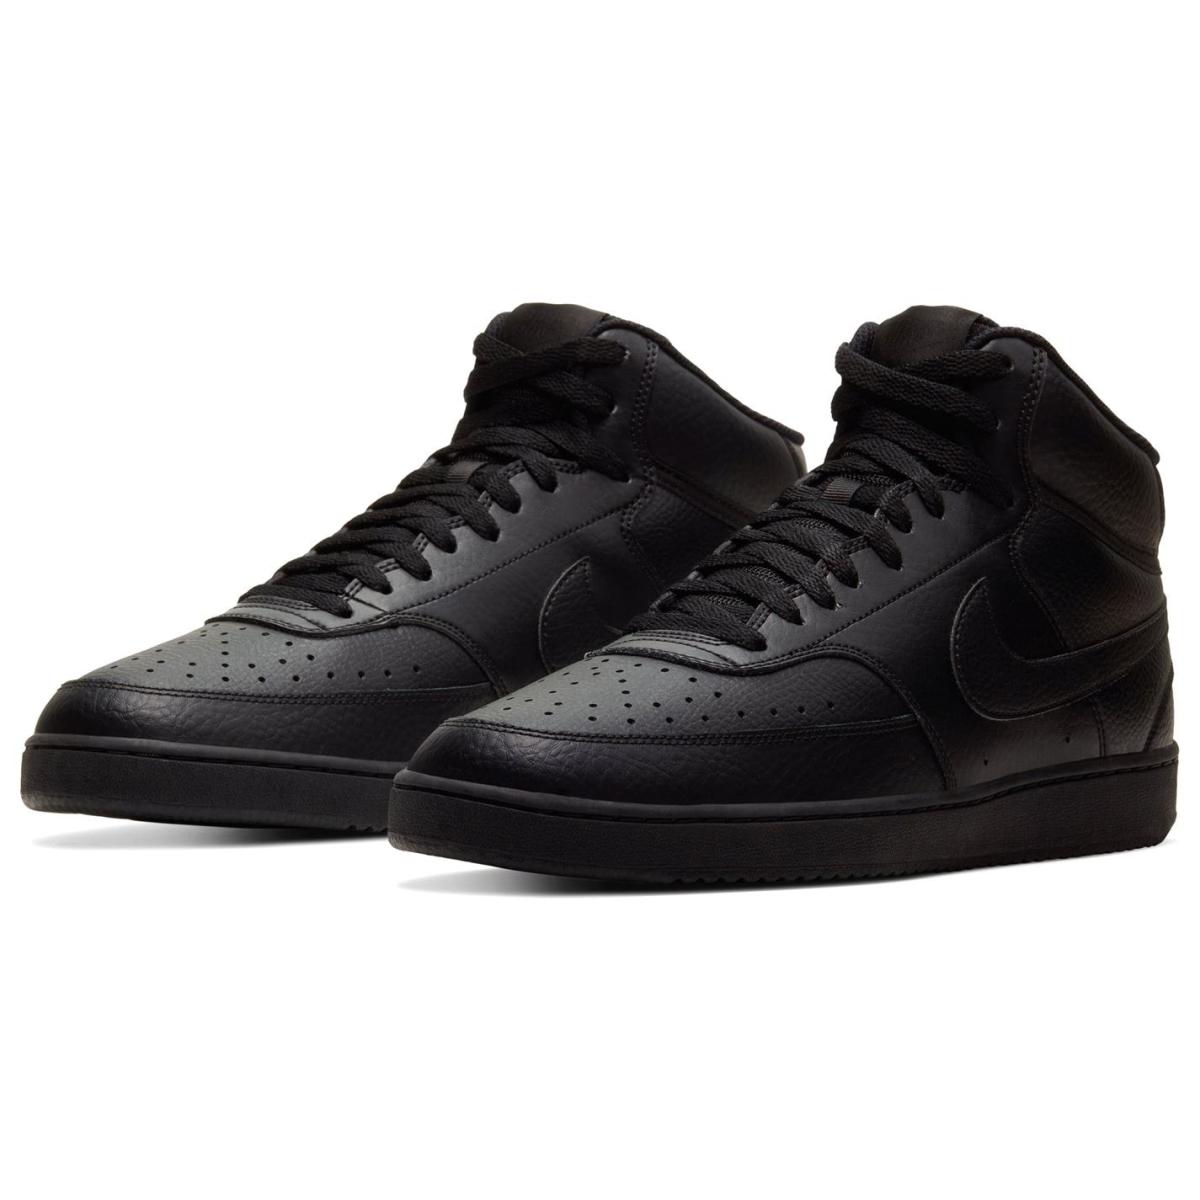 Nike Court Vision Mid Turnschuhe Herren Sneaker Sportschuhe Laufschuhe 1019